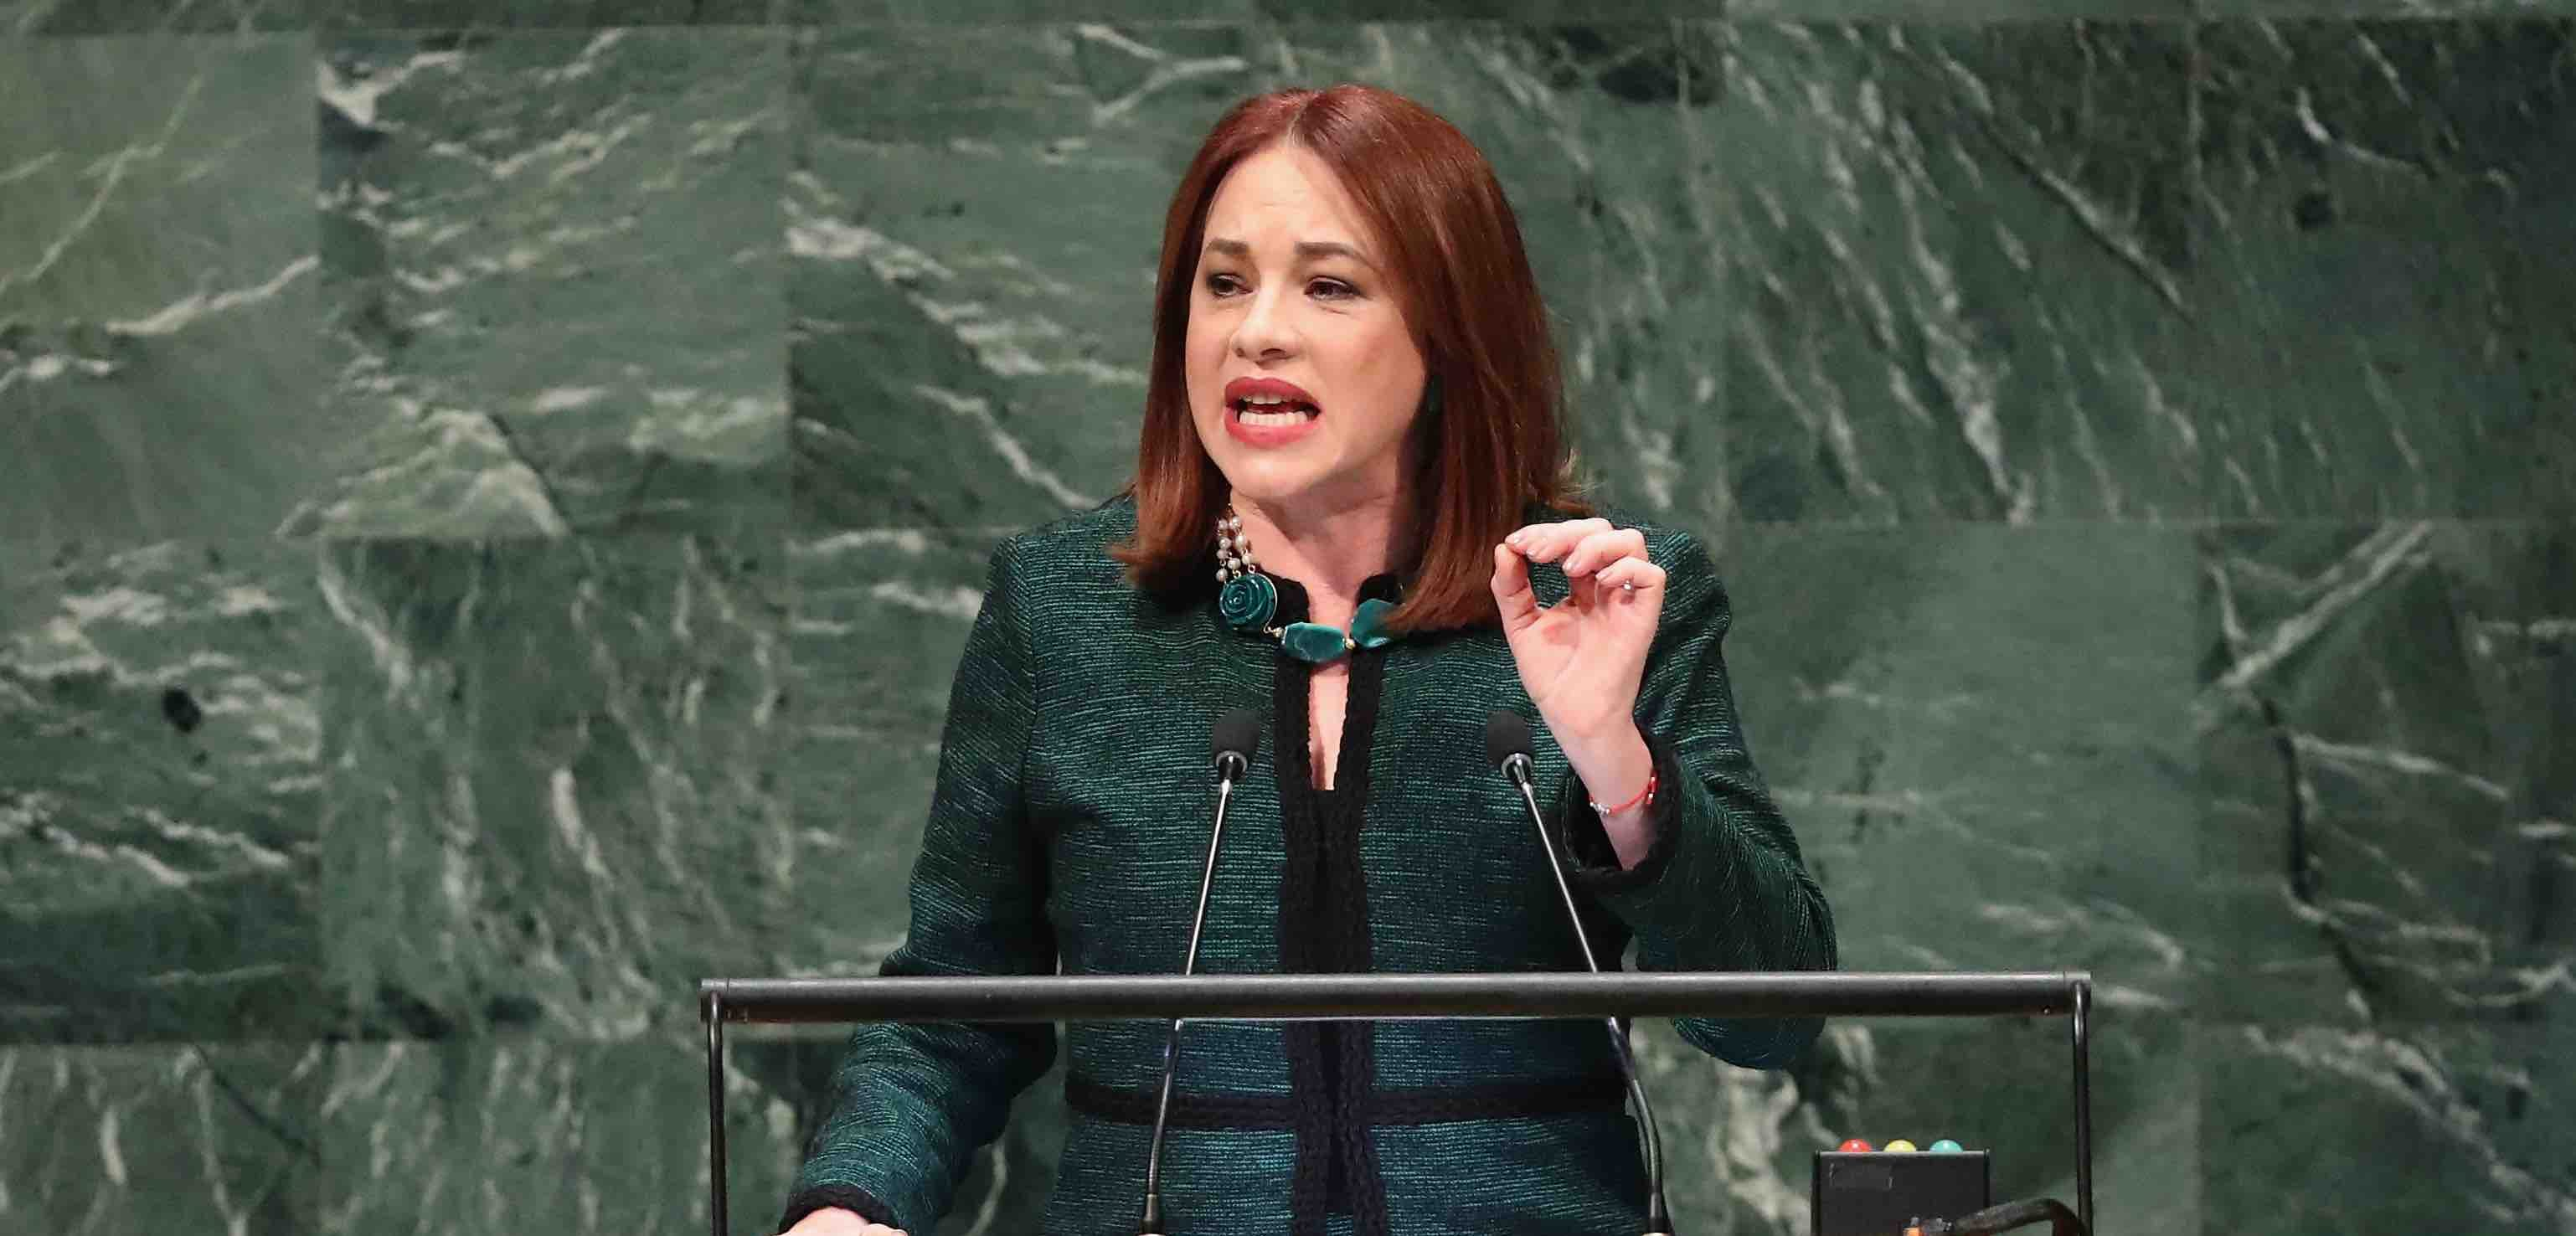 María Fernanda Espinosa Made History As UN General Assembly's First Latin American Woman President